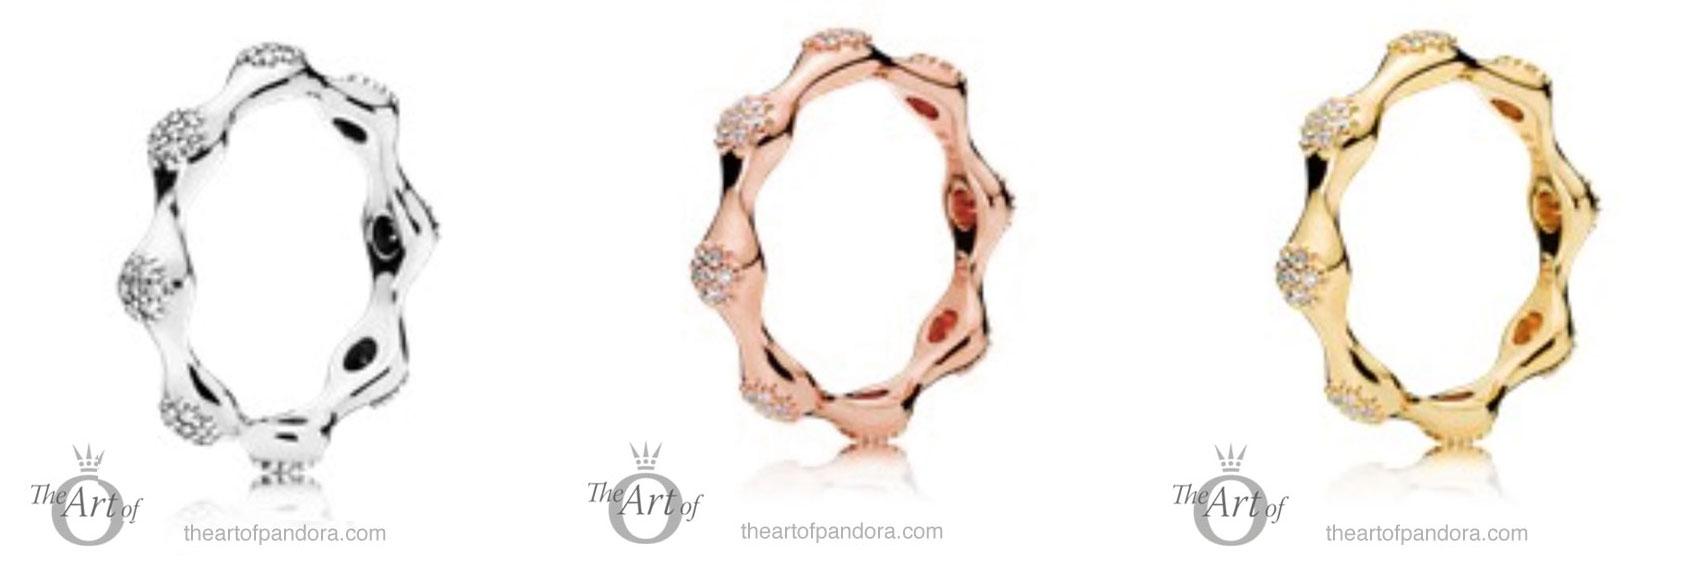 pandora 8 love pod rings rose shine the art of pandora Thank You Clip Art Tiger Tigger Party